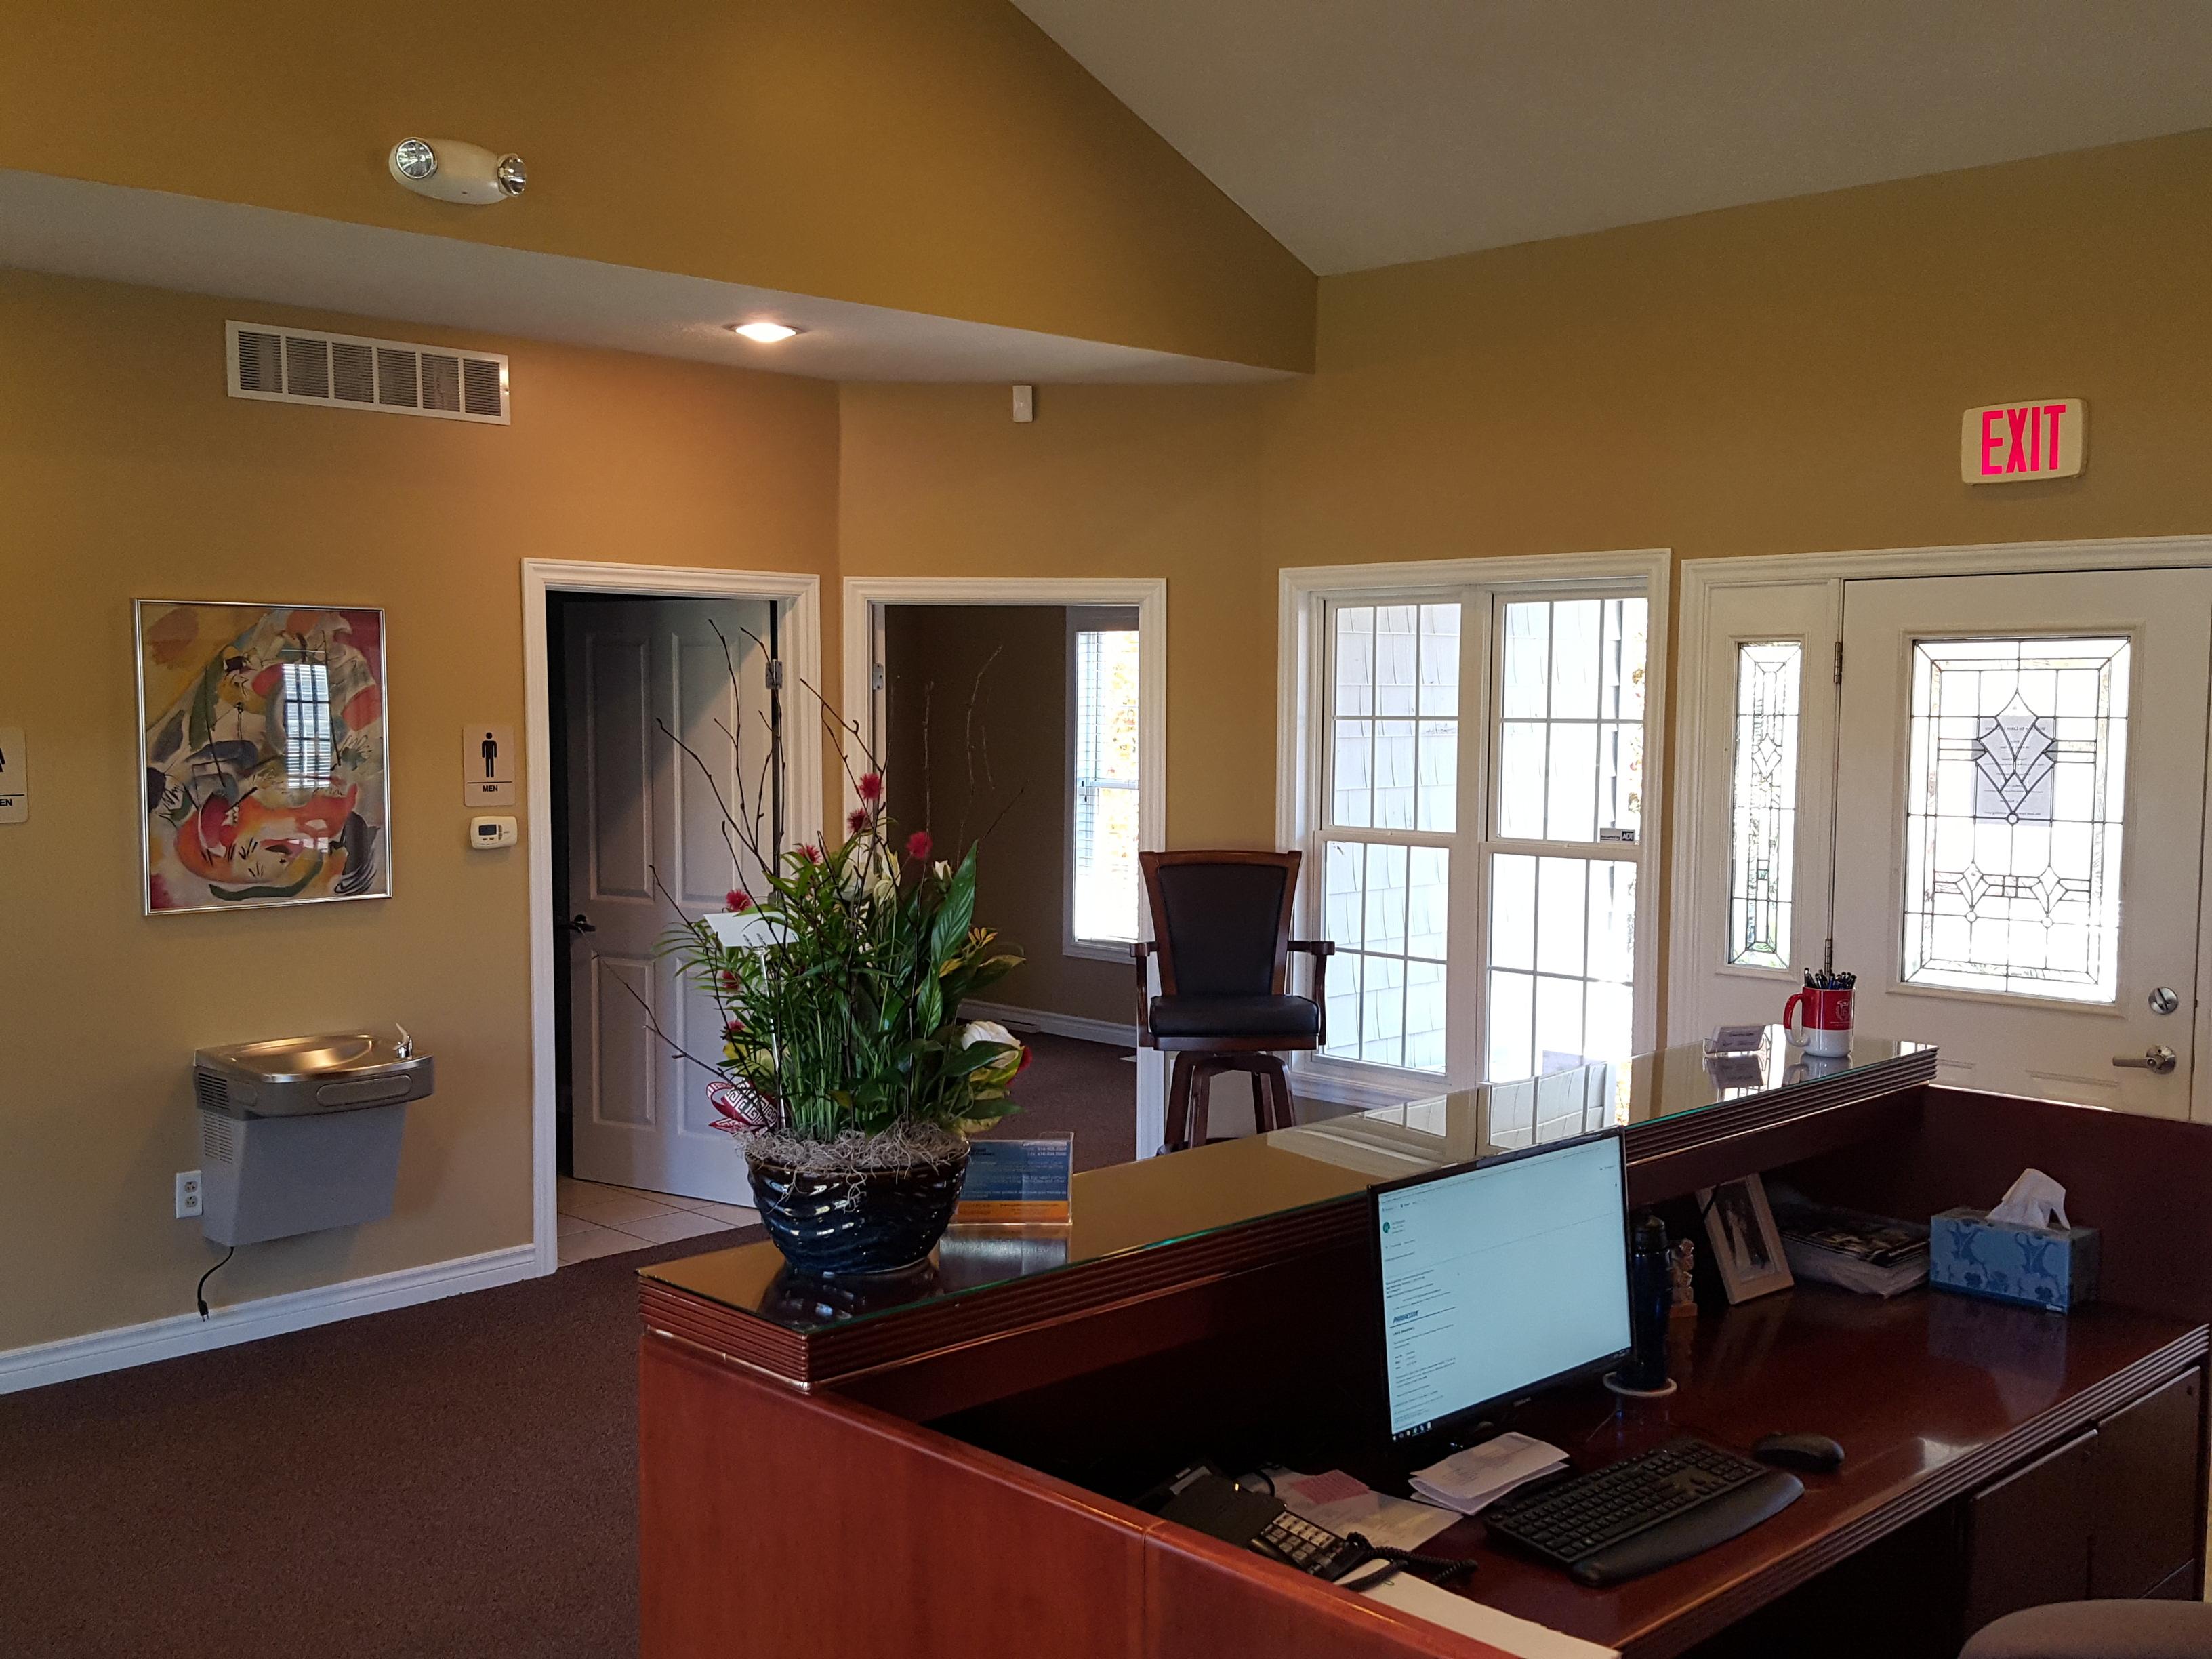 Office Laker Insurance Allendale (616)986-1216